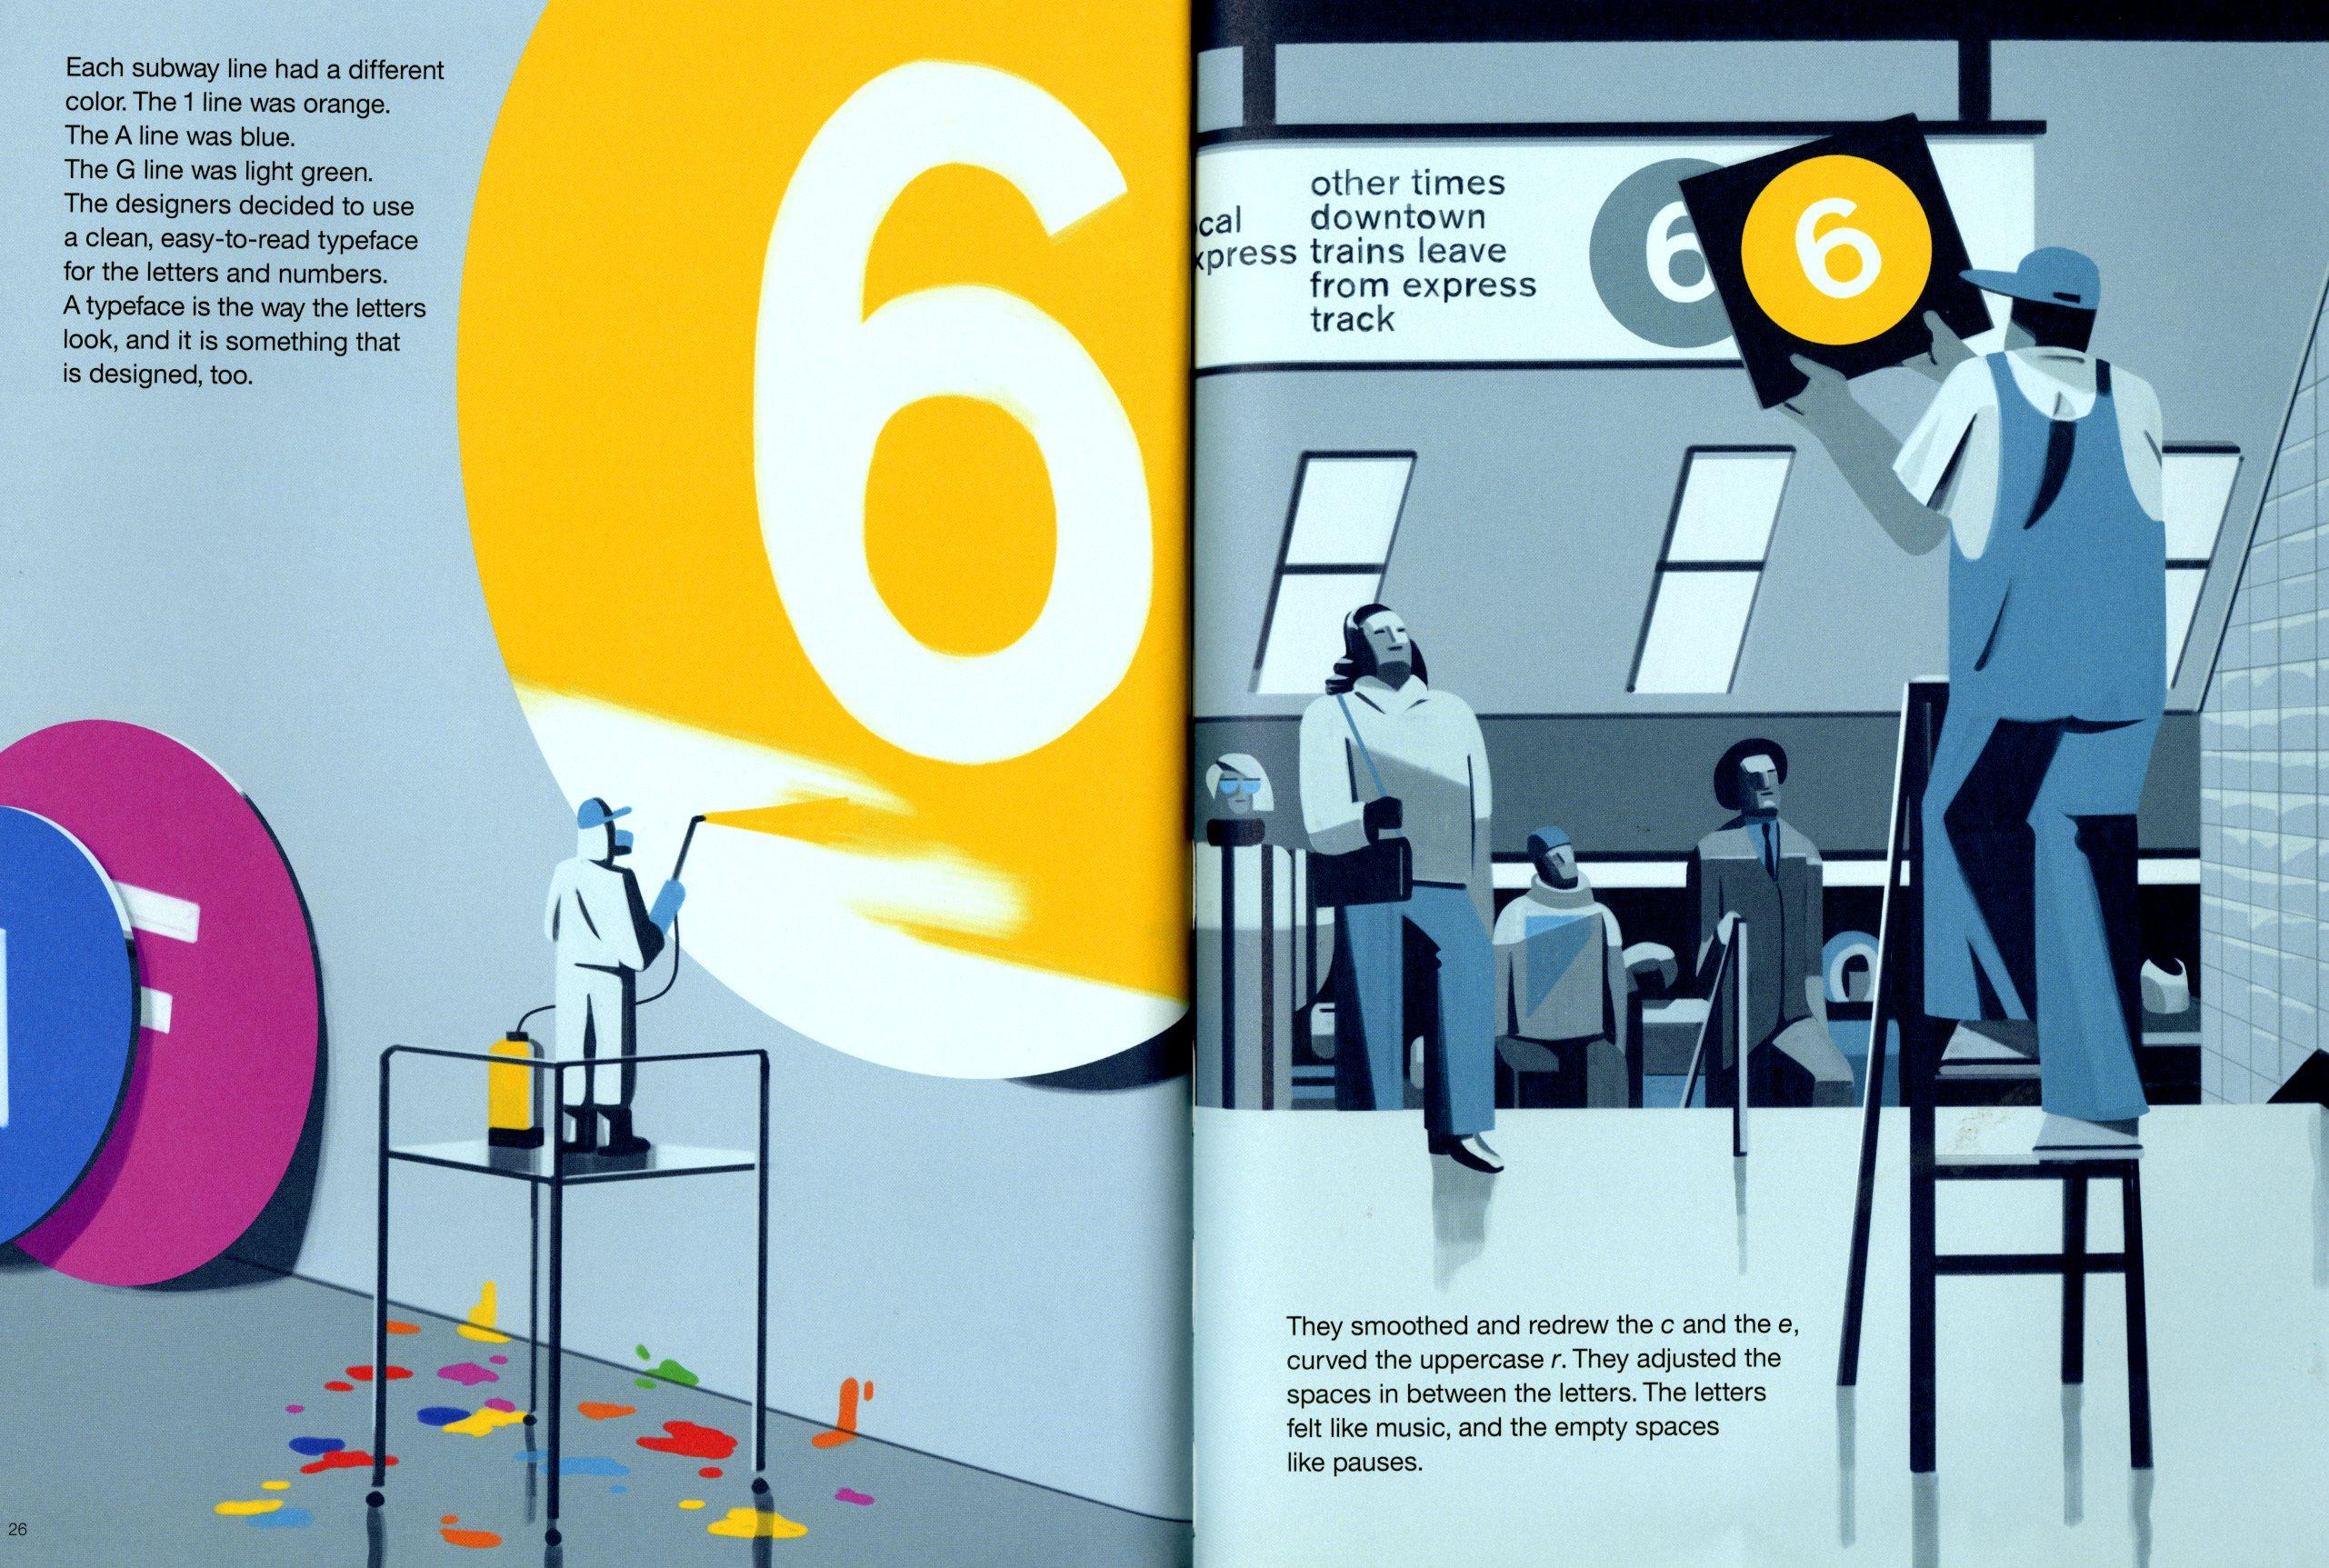 Nyc Subway Map Author Emiliano Ponzi.Vignelli S Subway Map For Little Ones Design Observer